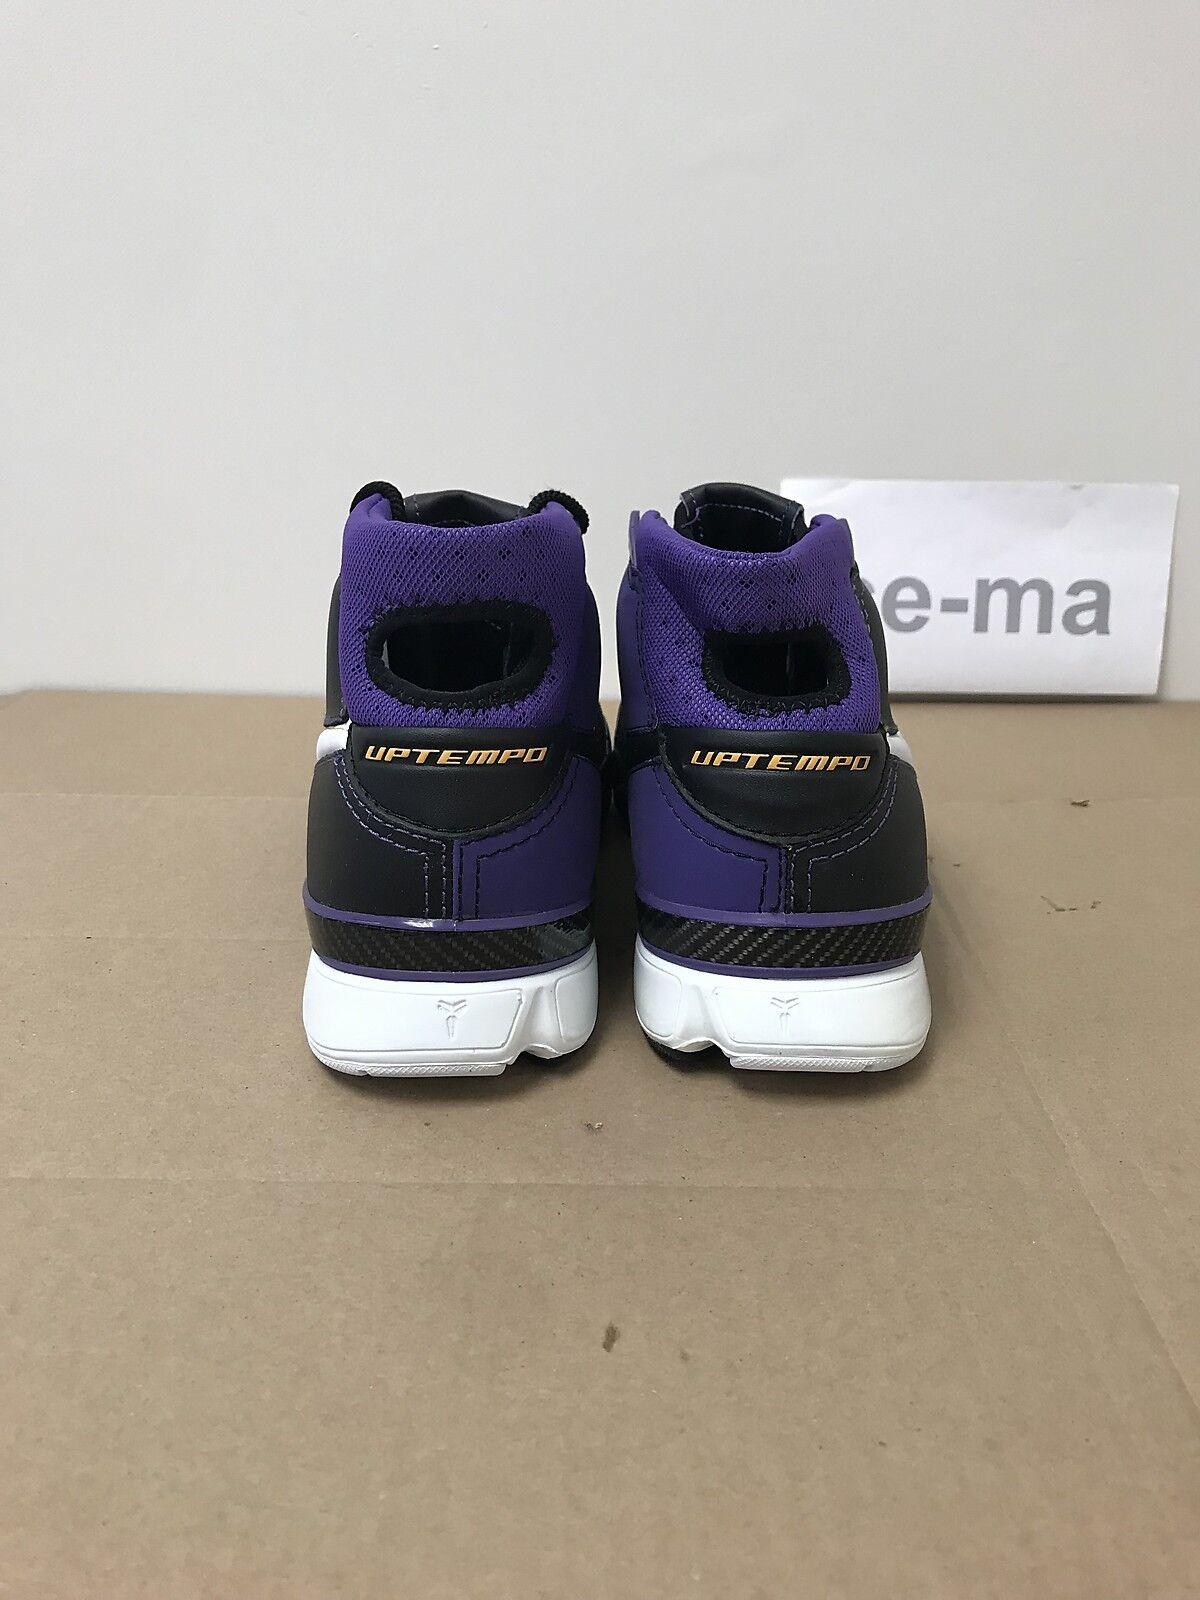 4a42a99dbe57 ... Nike Zoom Kobe 1 Black Purple gold gold gold Bryant Original 2006  Limited 313143-014 ...